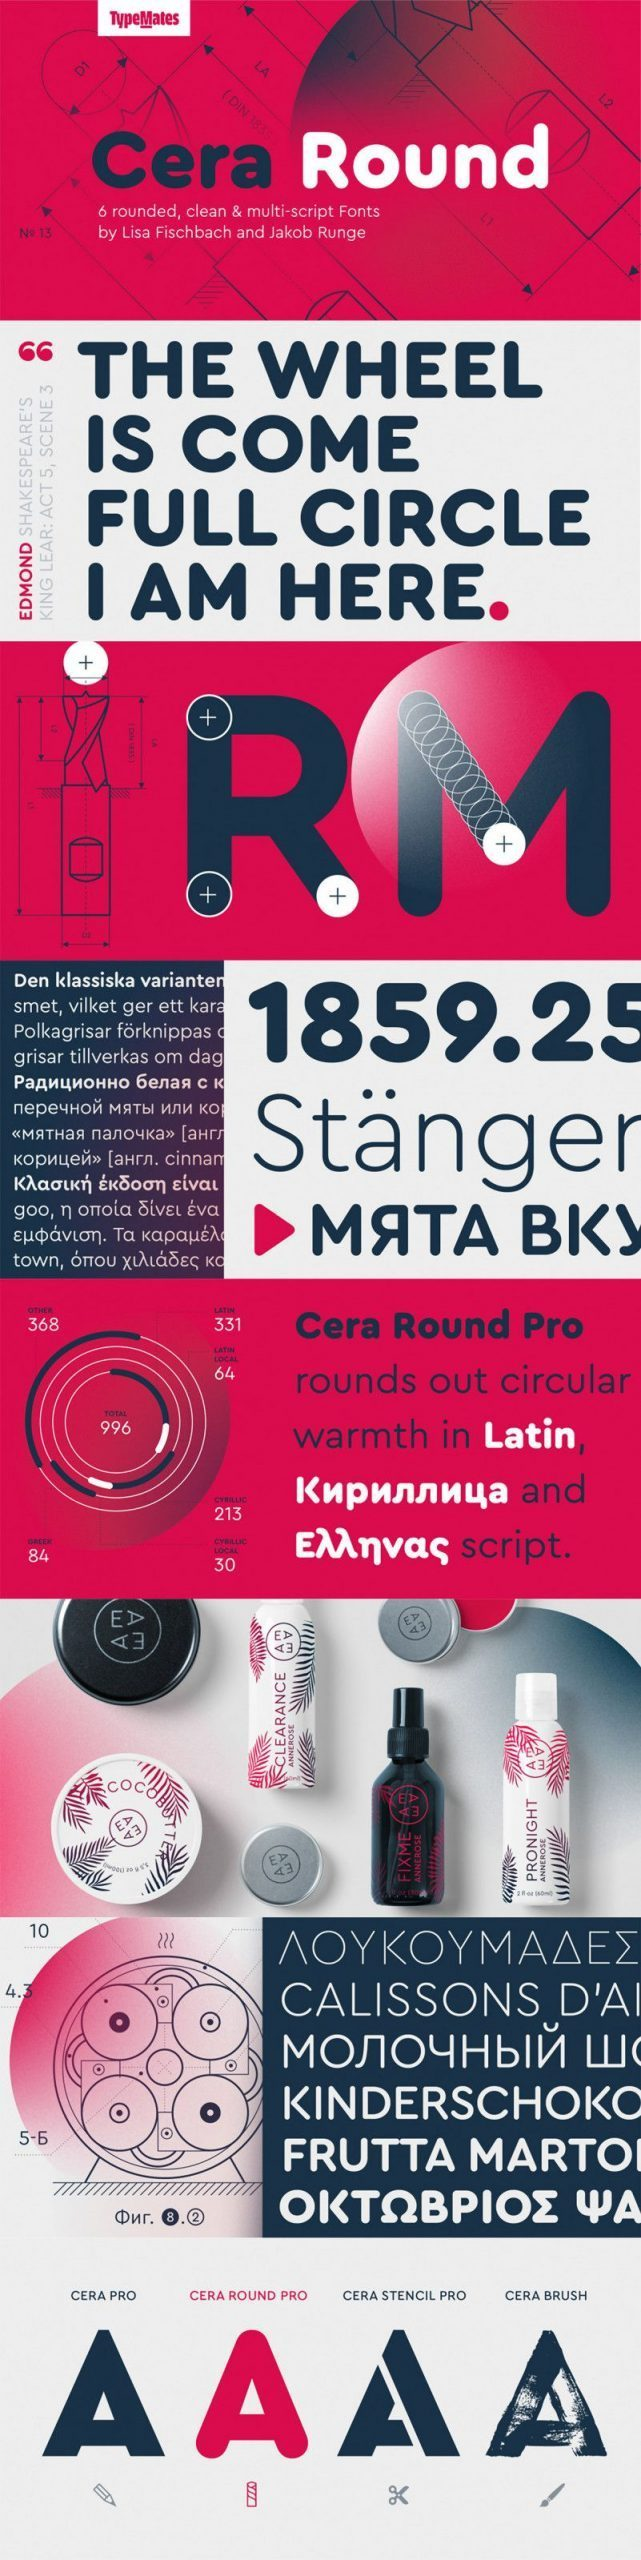 cera-round-pro-font-family-2-scaled